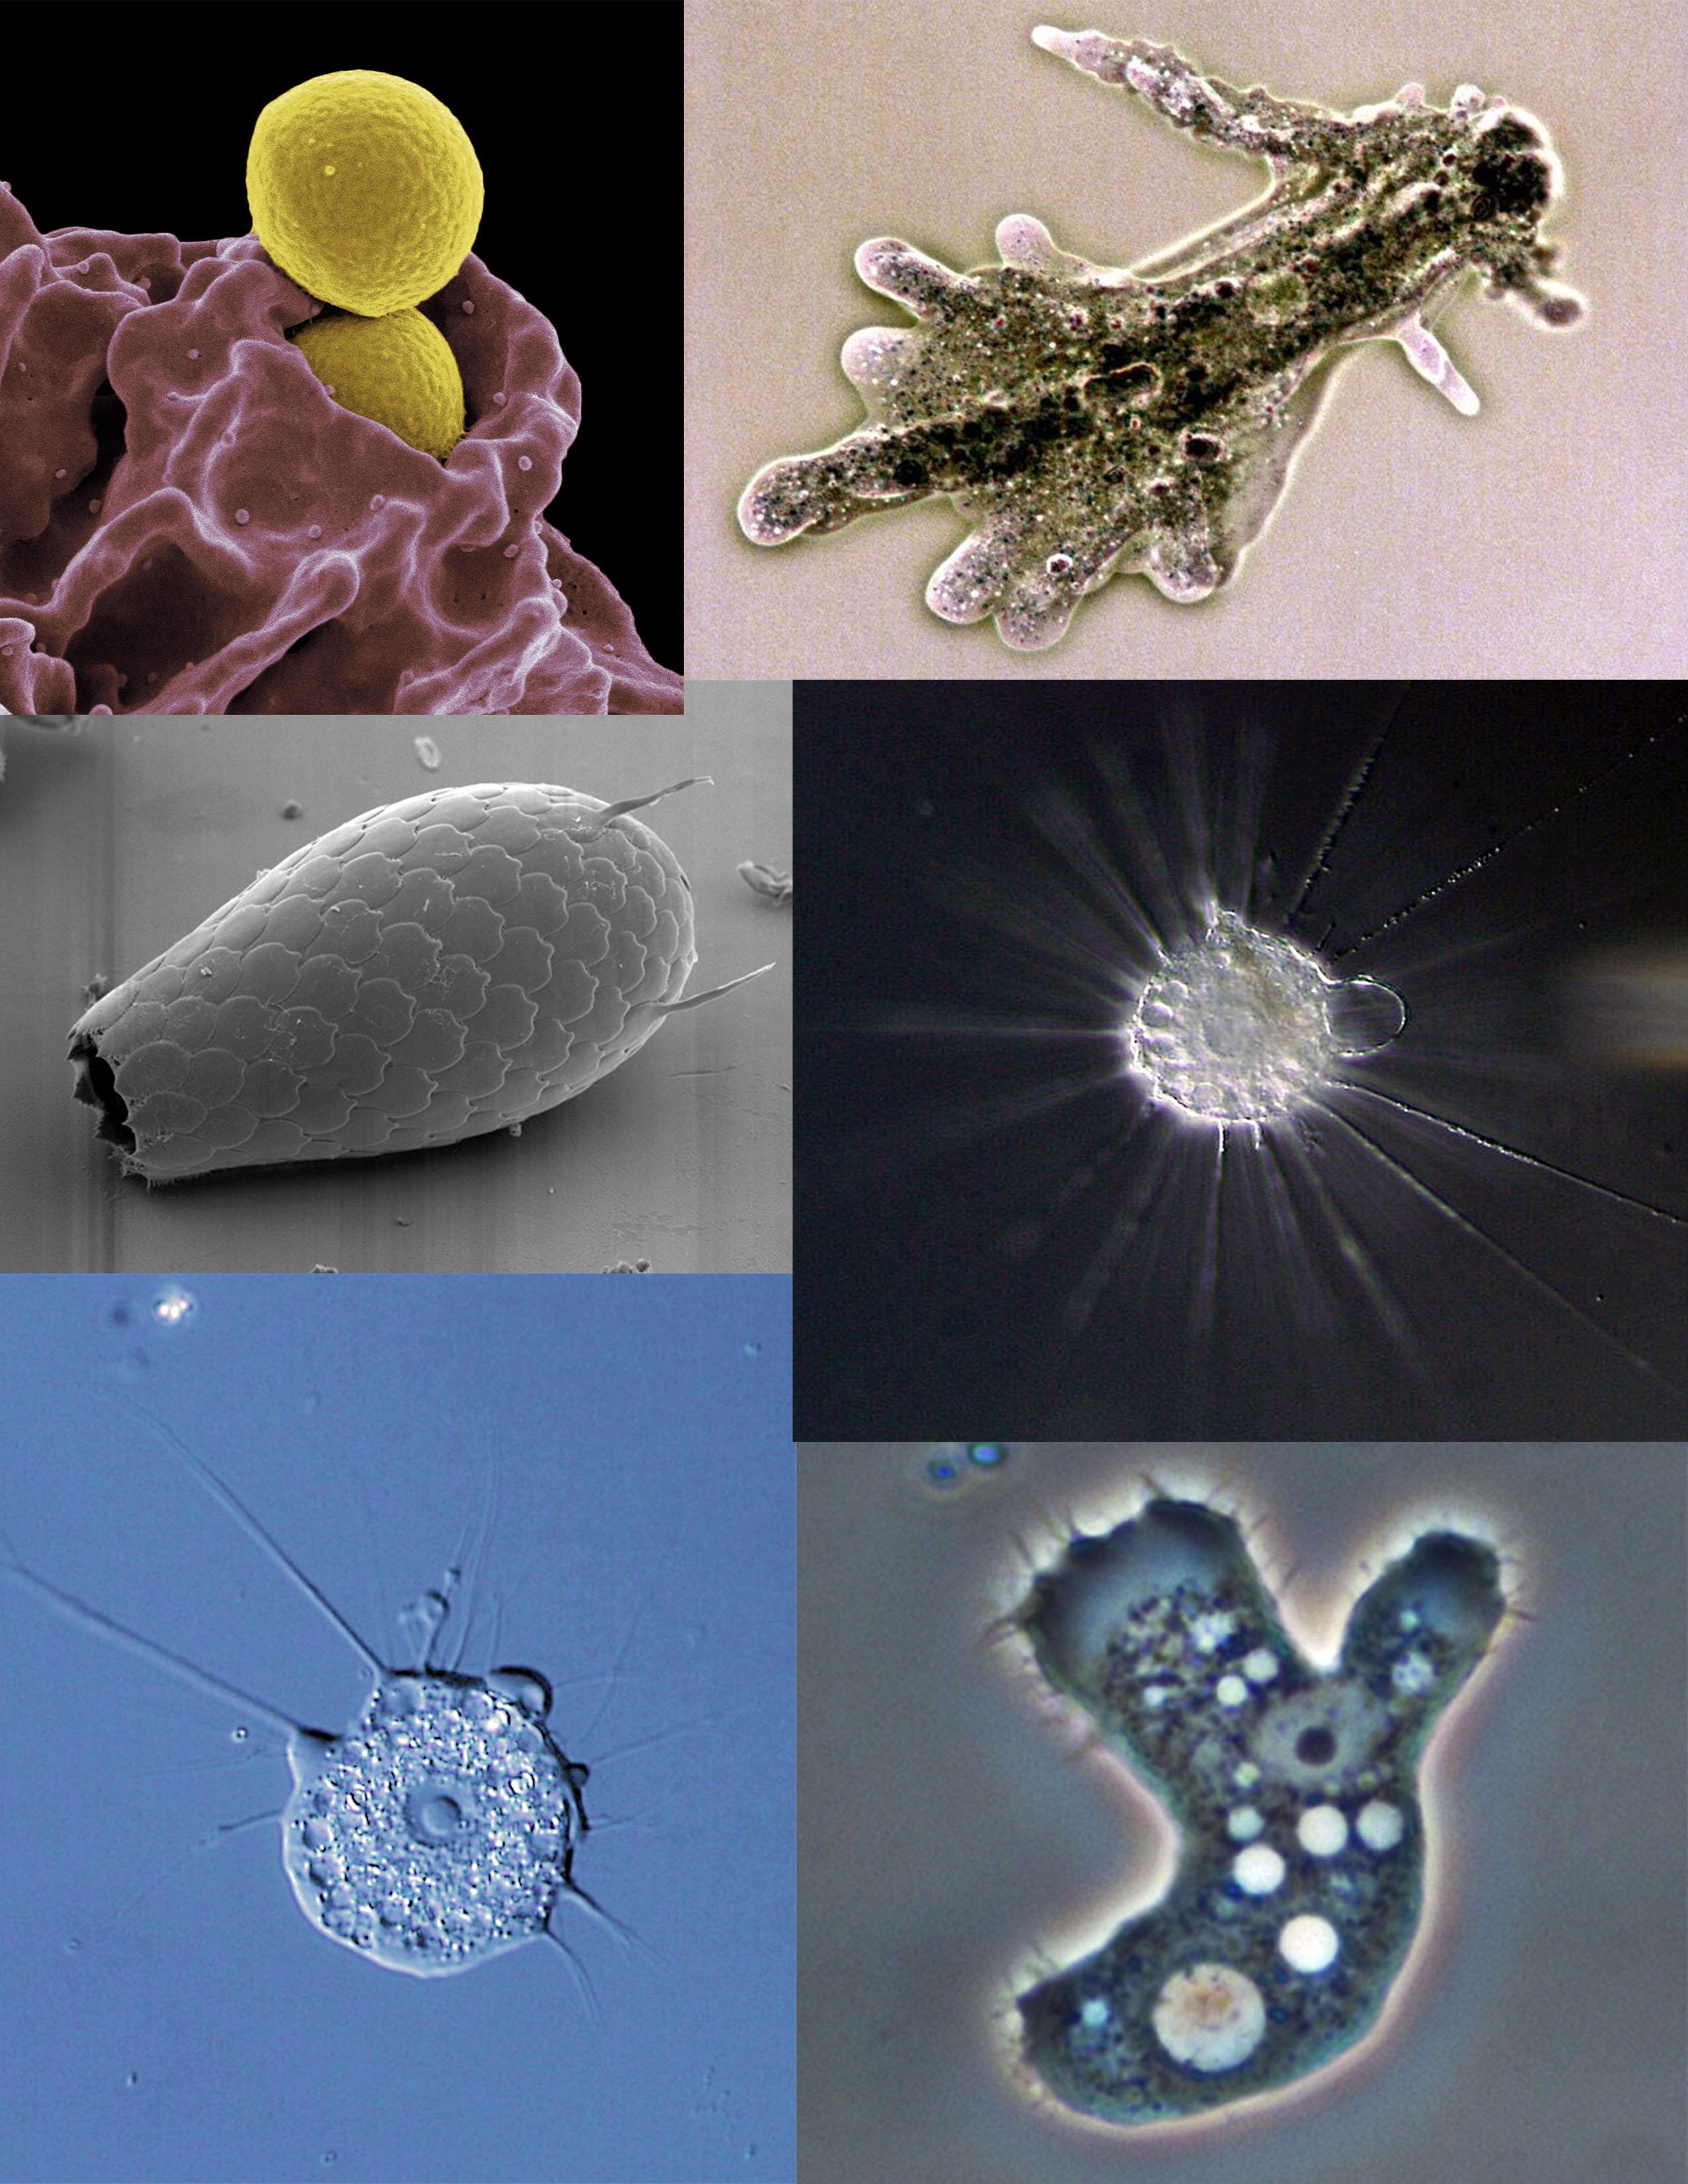 organismele parazite produc